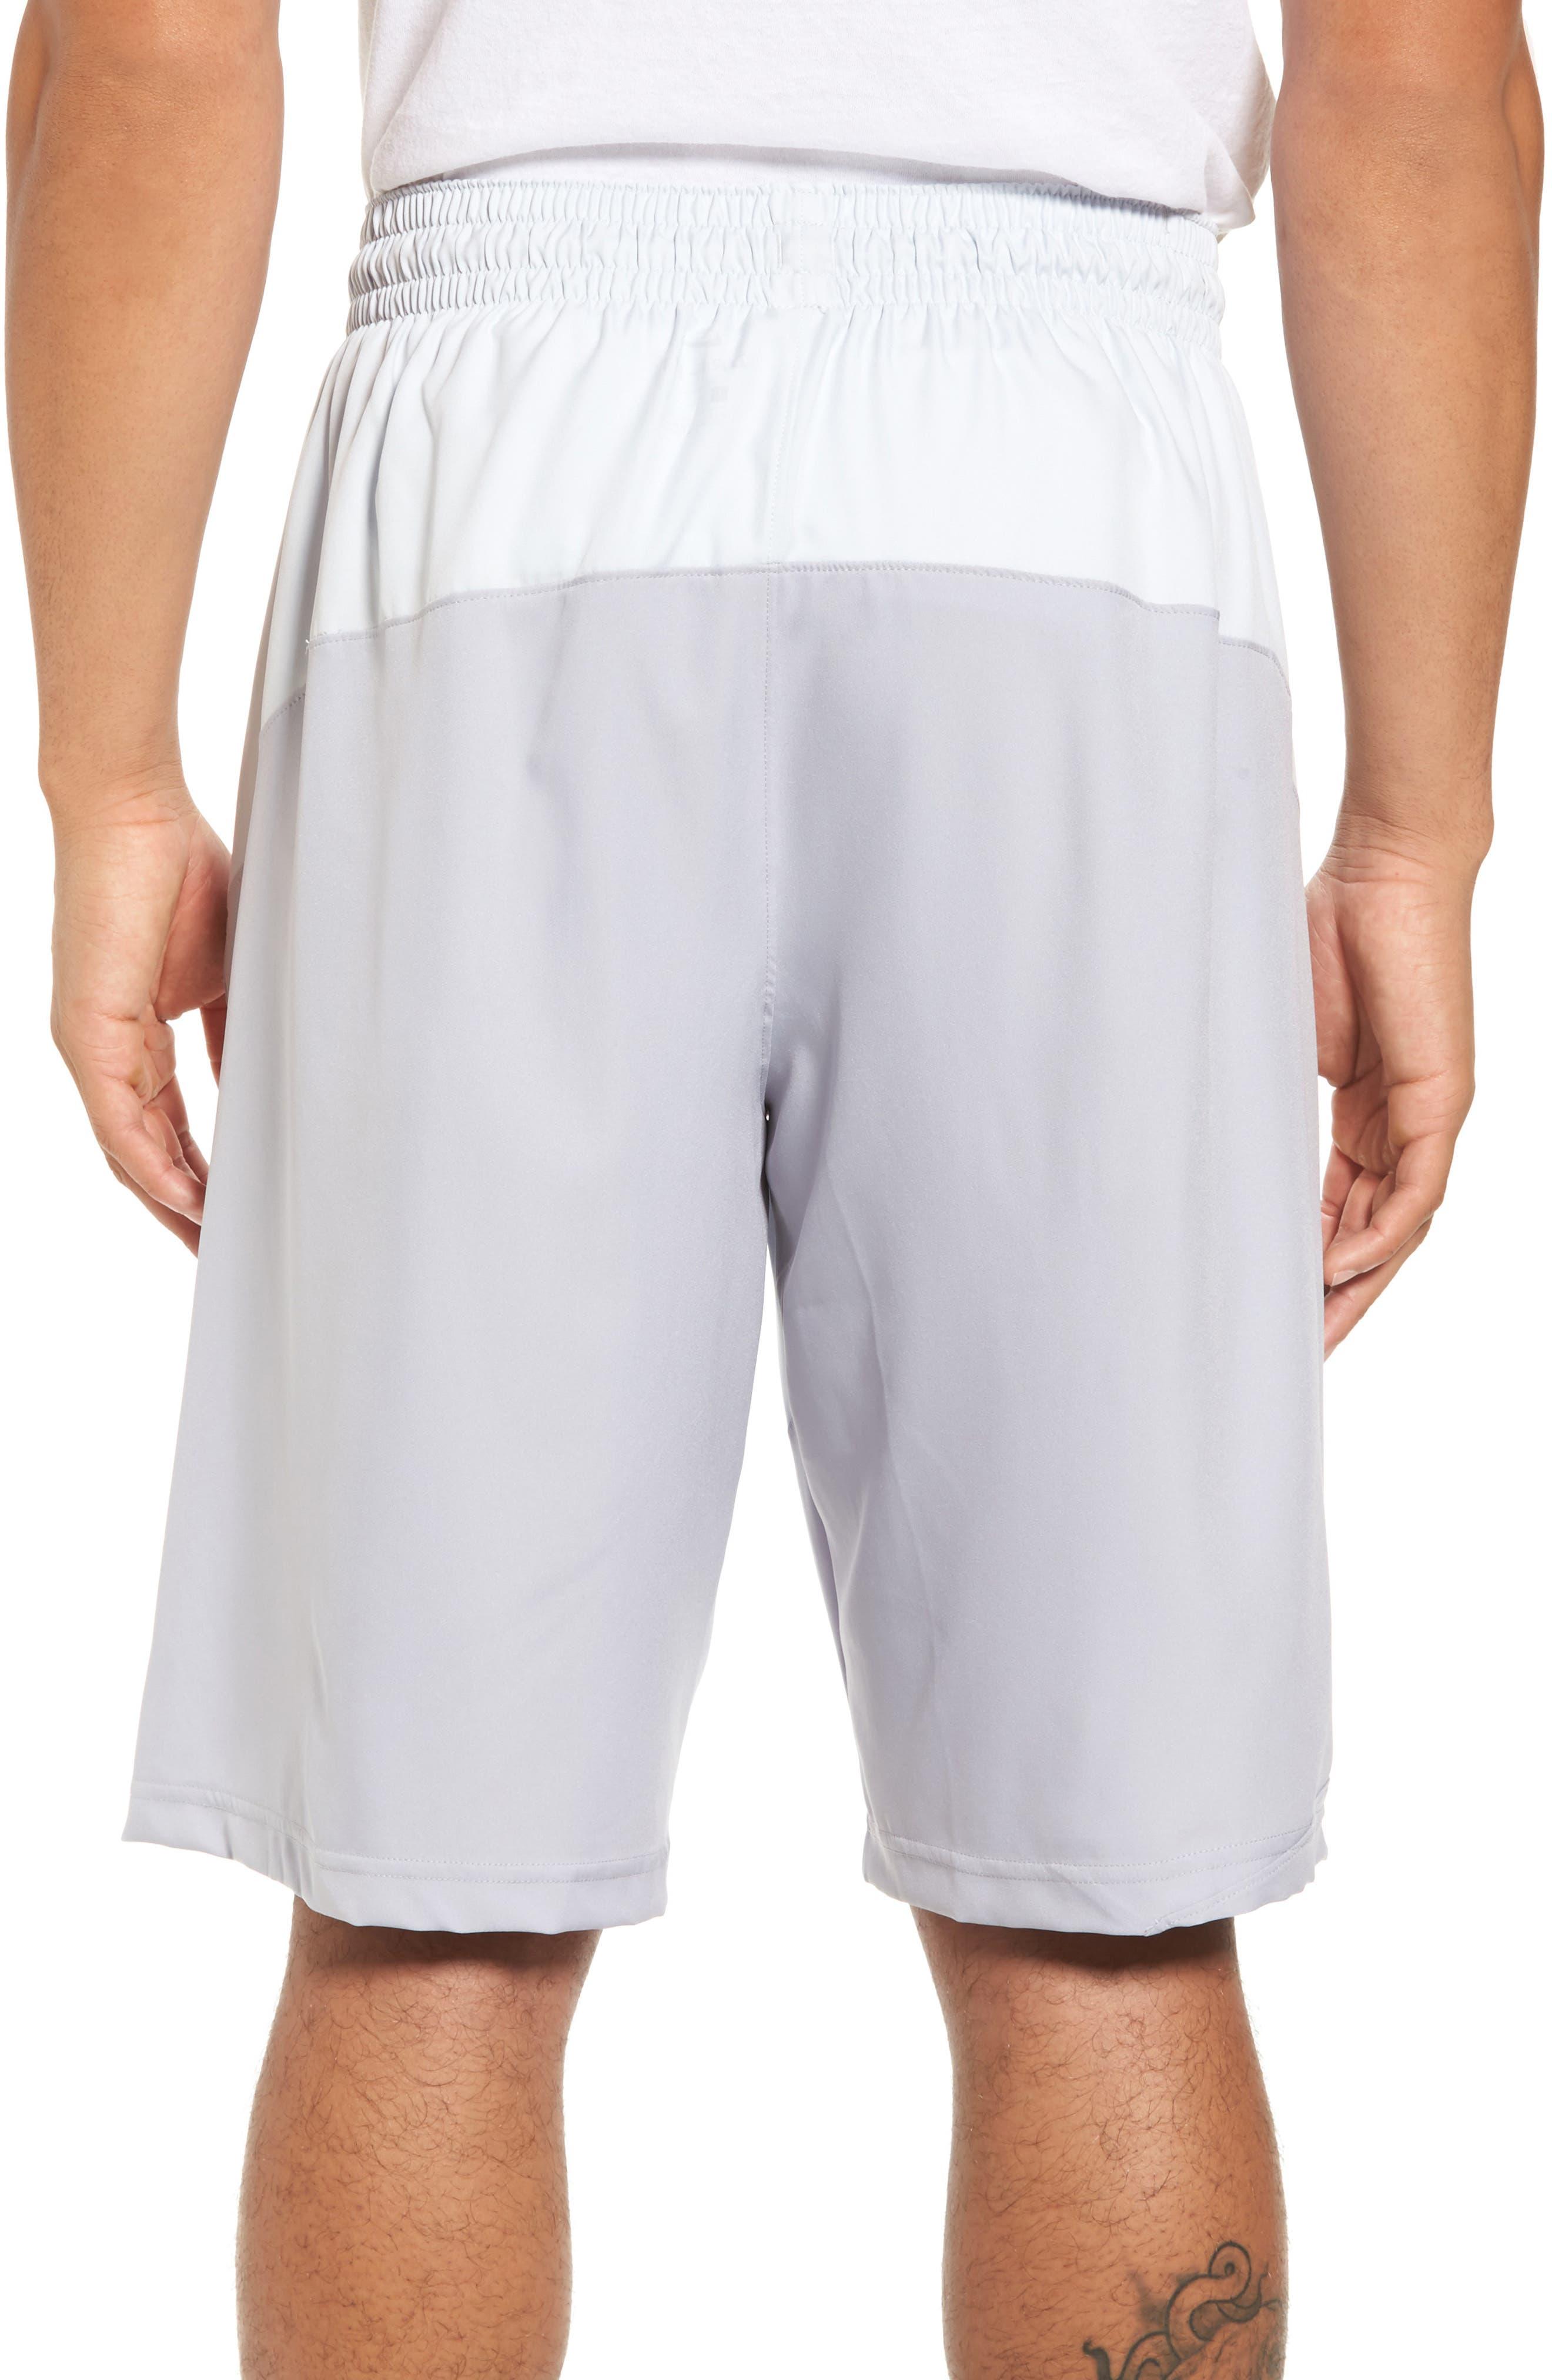 Dry Shorts,                             Alternate thumbnail 2, color,                             027